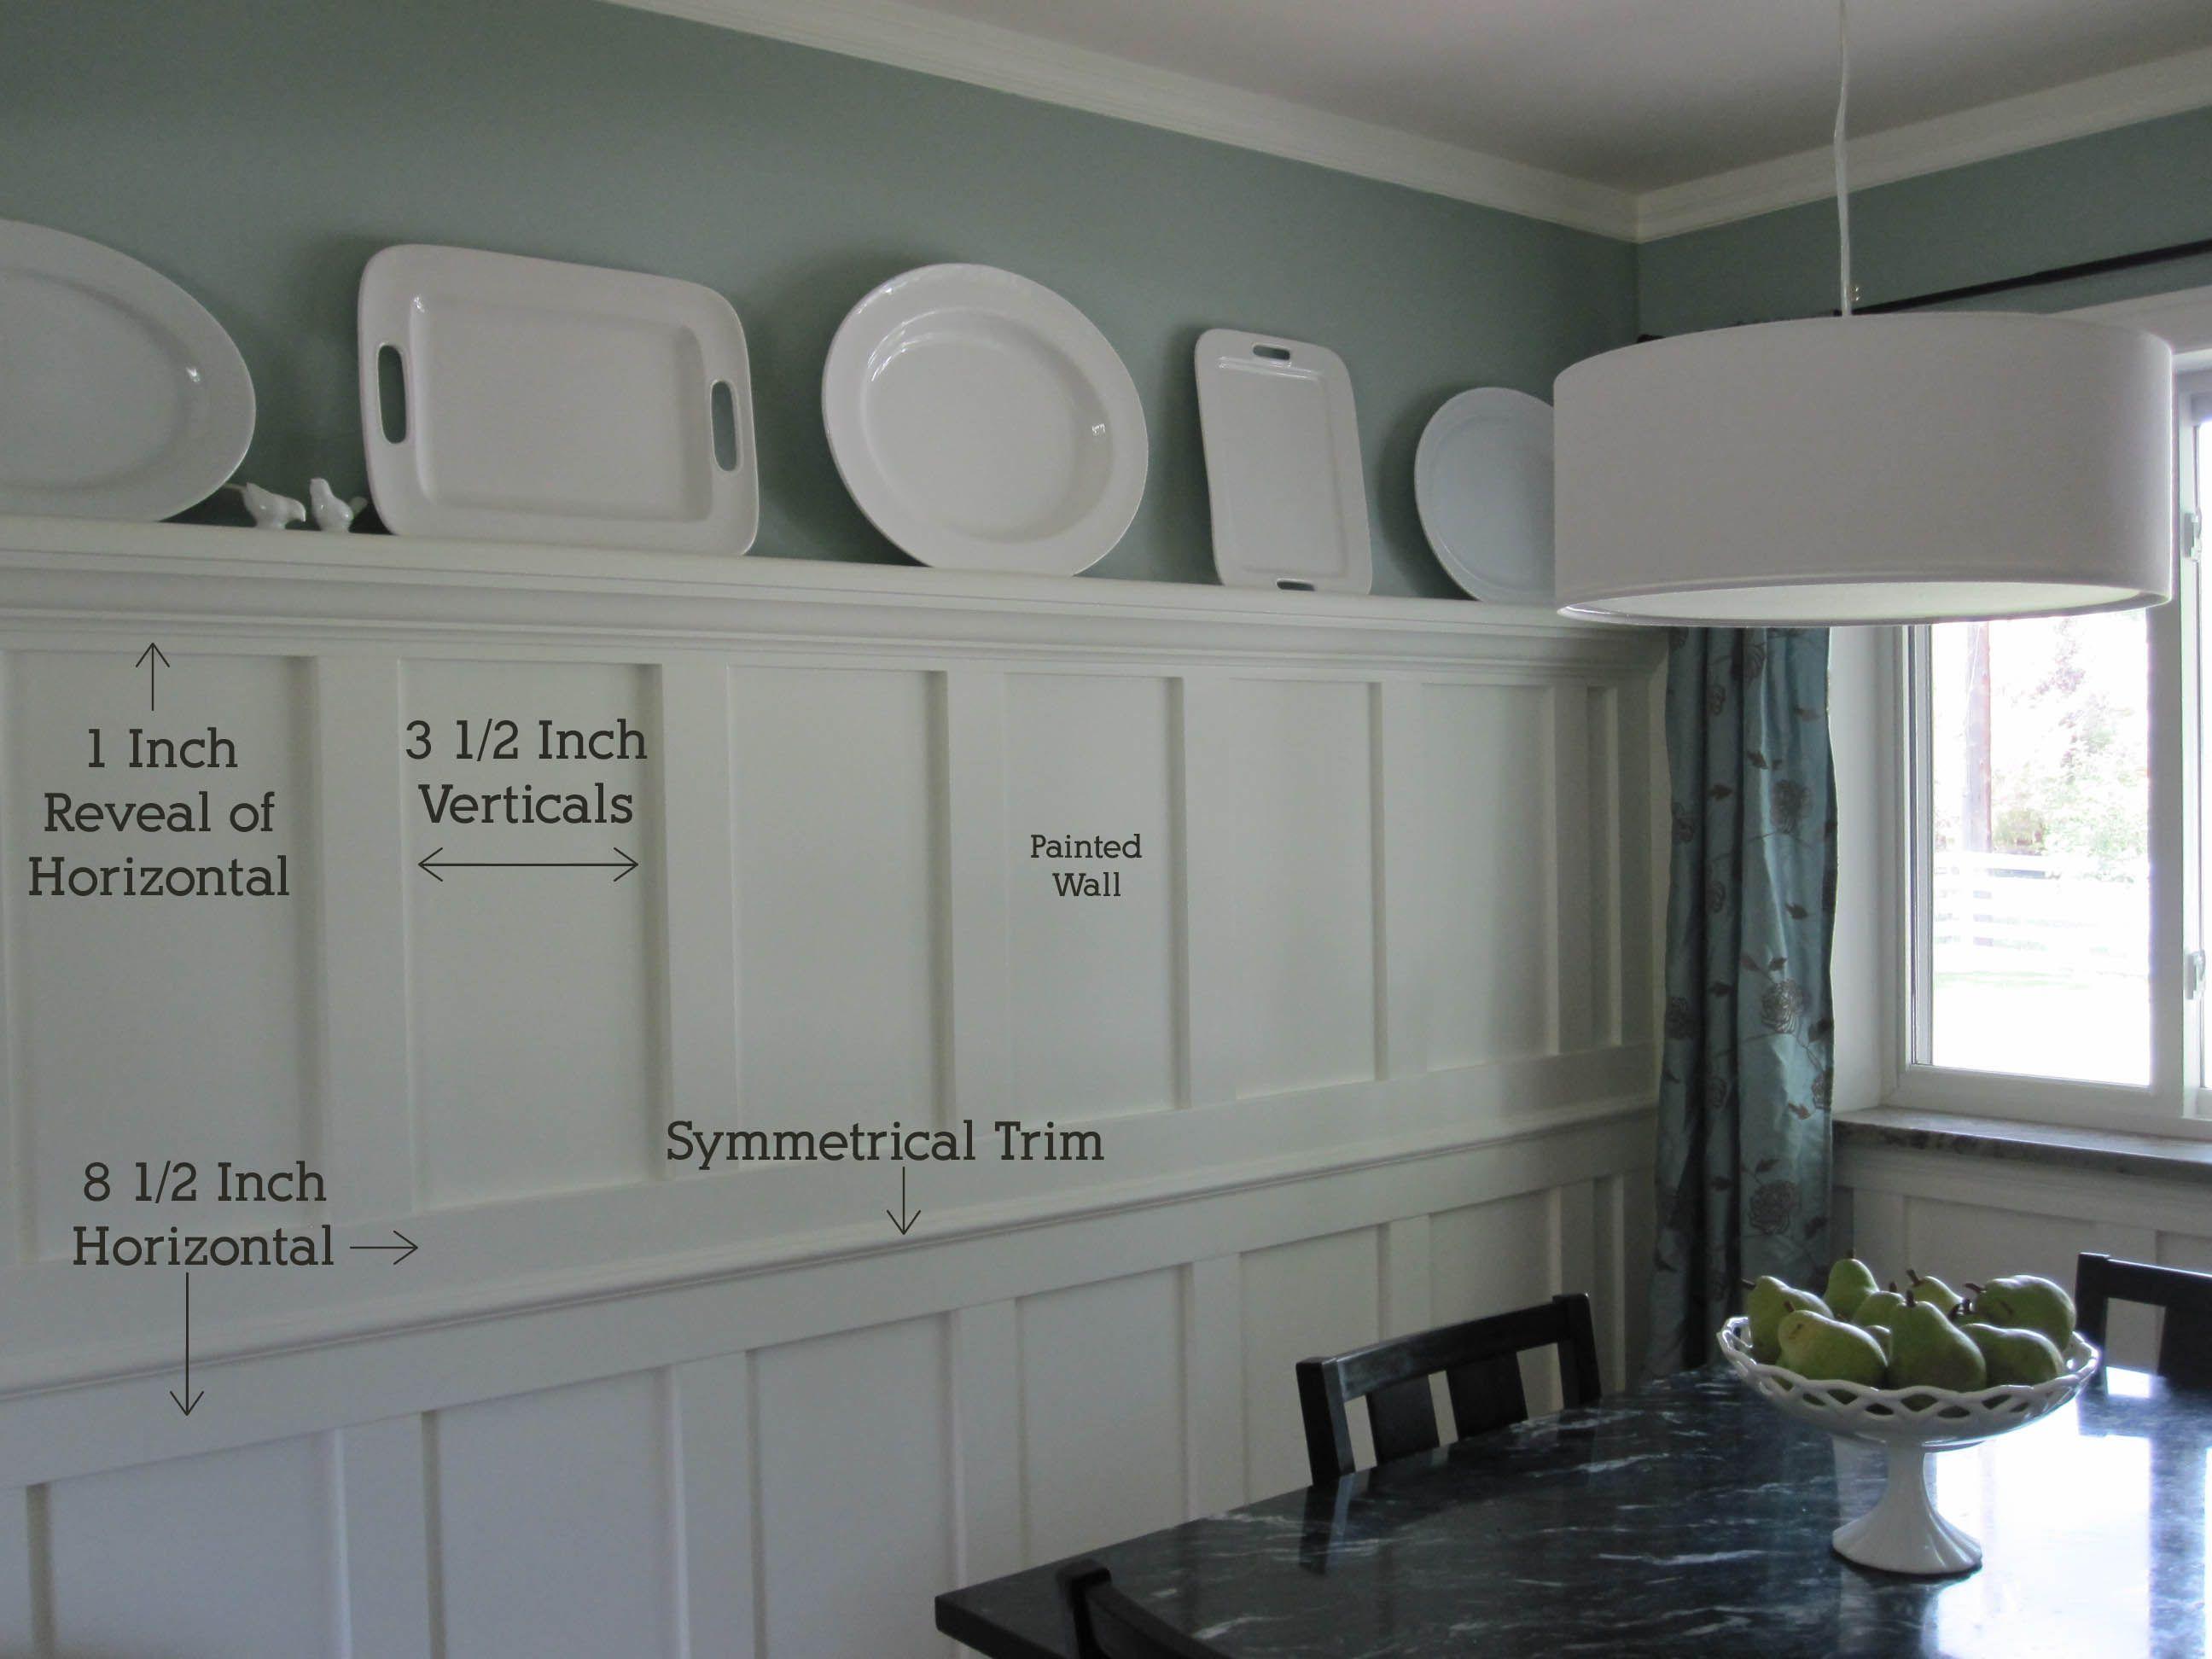 Google Image Result For Httpourhumbleabodeblogfileswordpress Inspiration Dining Room Wall Trim Design Ideas